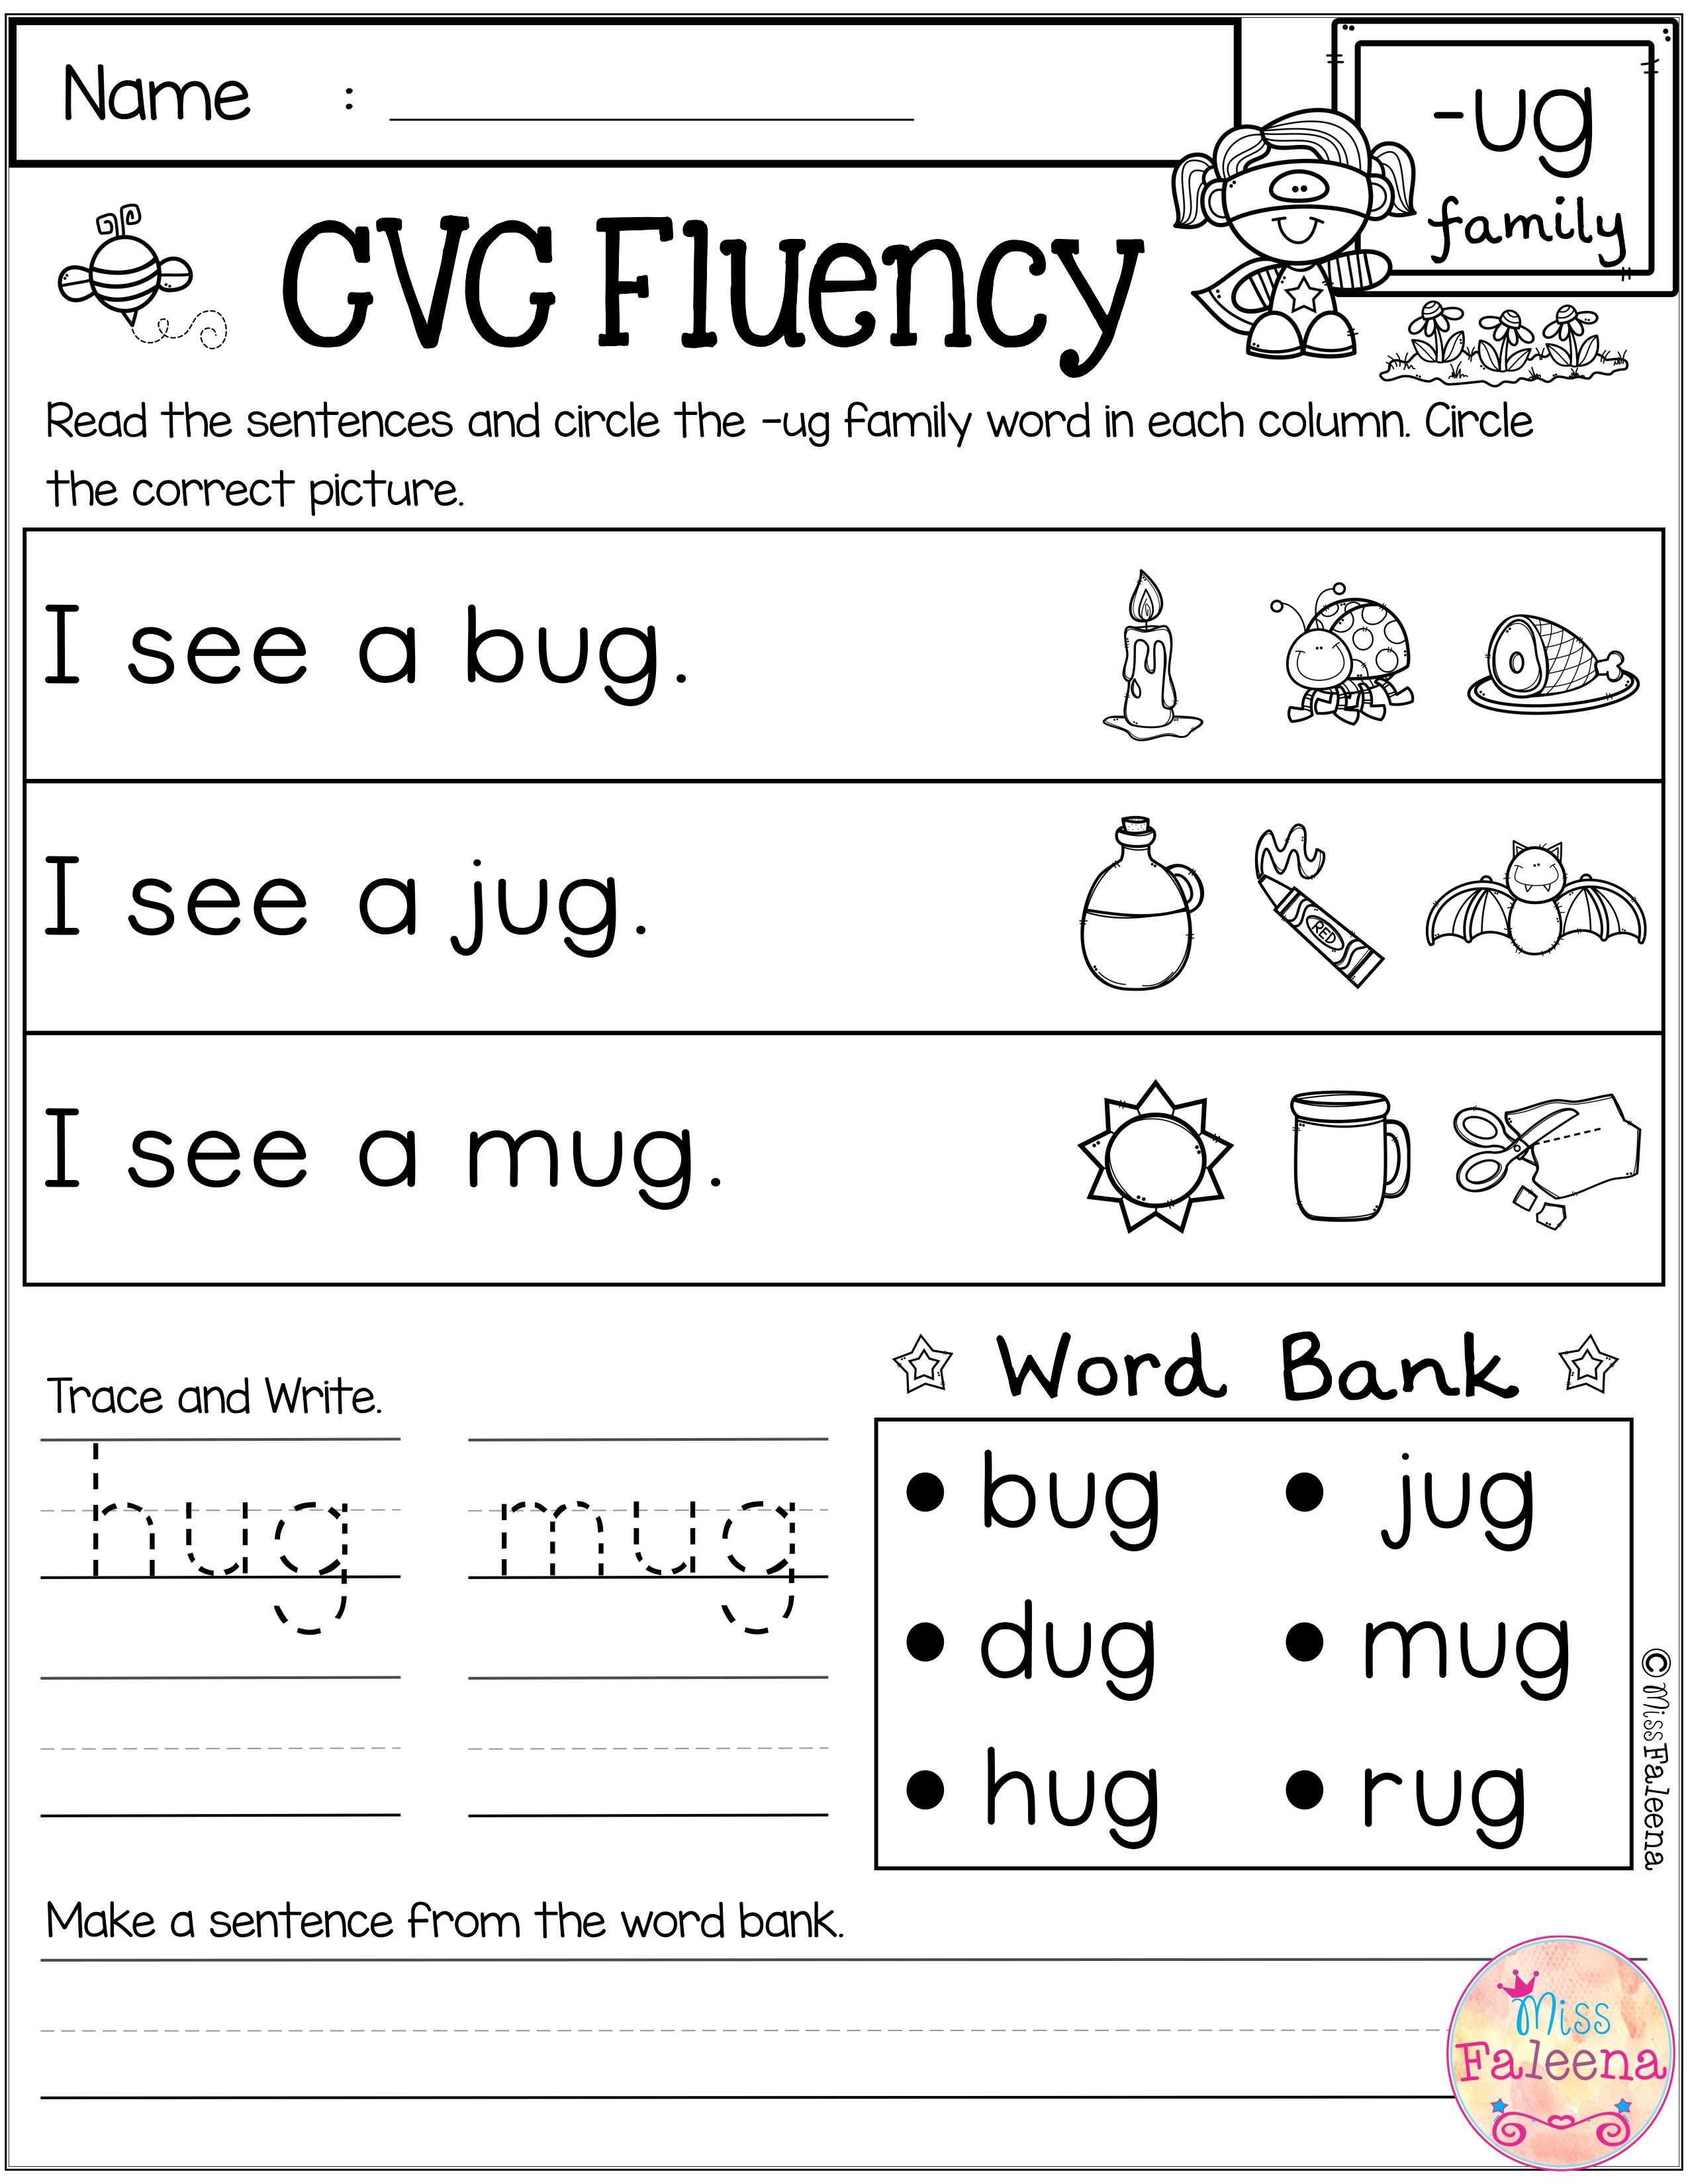 Cvc Fluency With Images Cvc Fluency Lessons For Kids Cvc Words